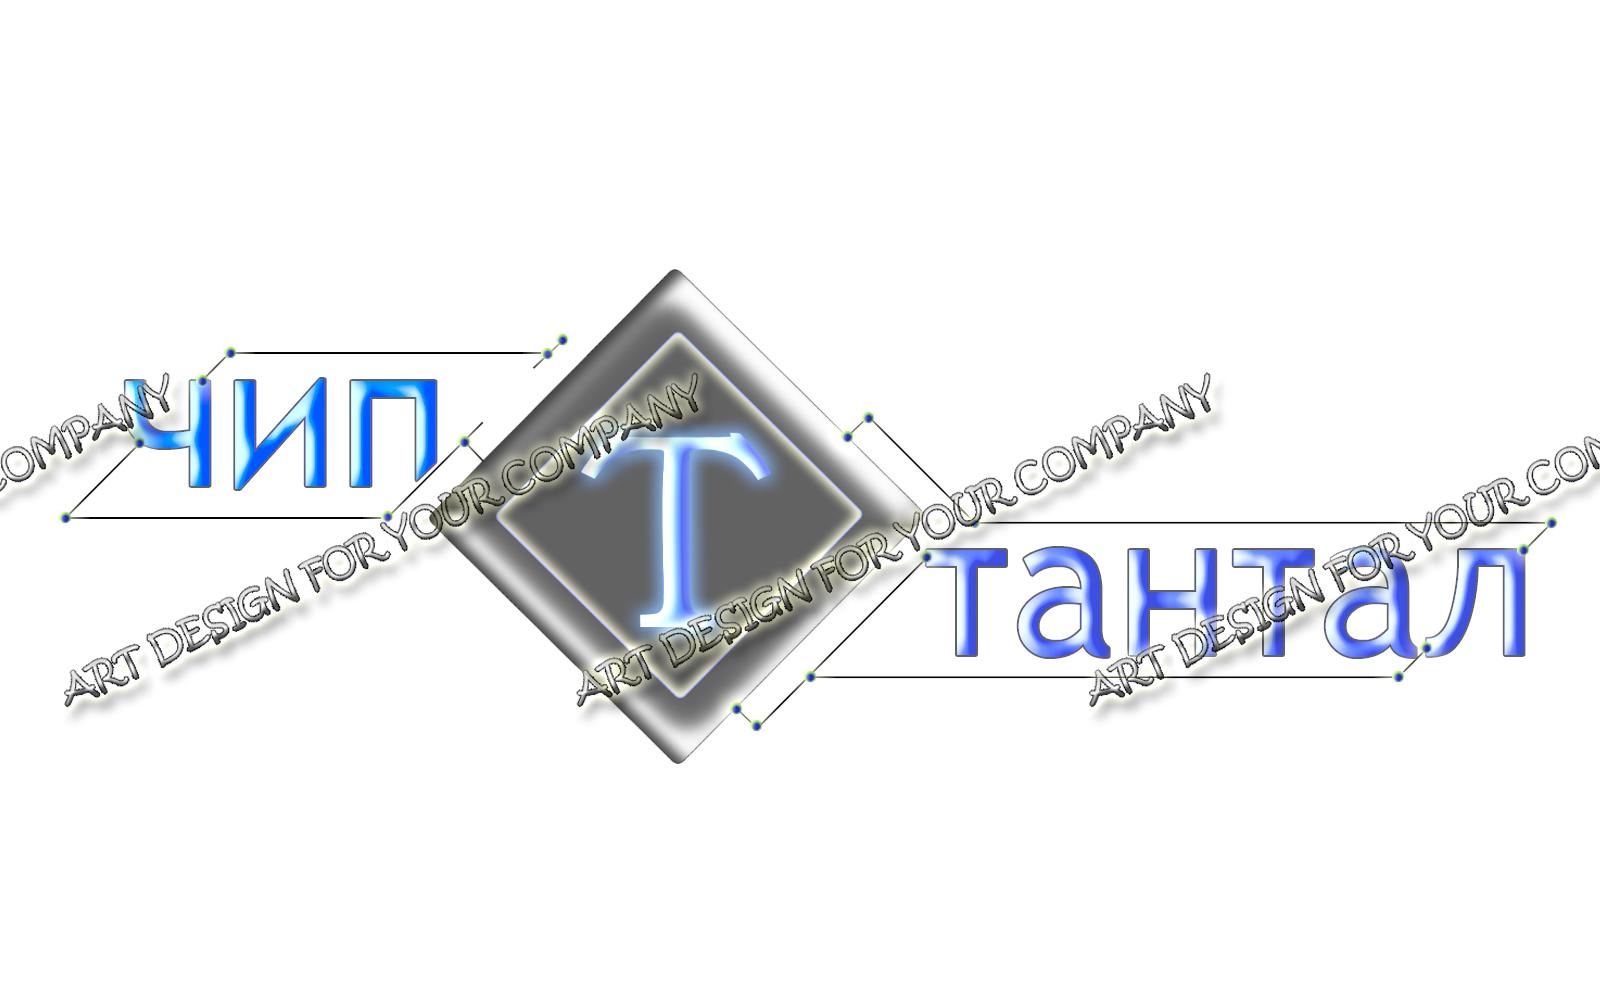 Логотип + Дизайн настольного календаря фото f_5065a27f1175cf7d.jpg